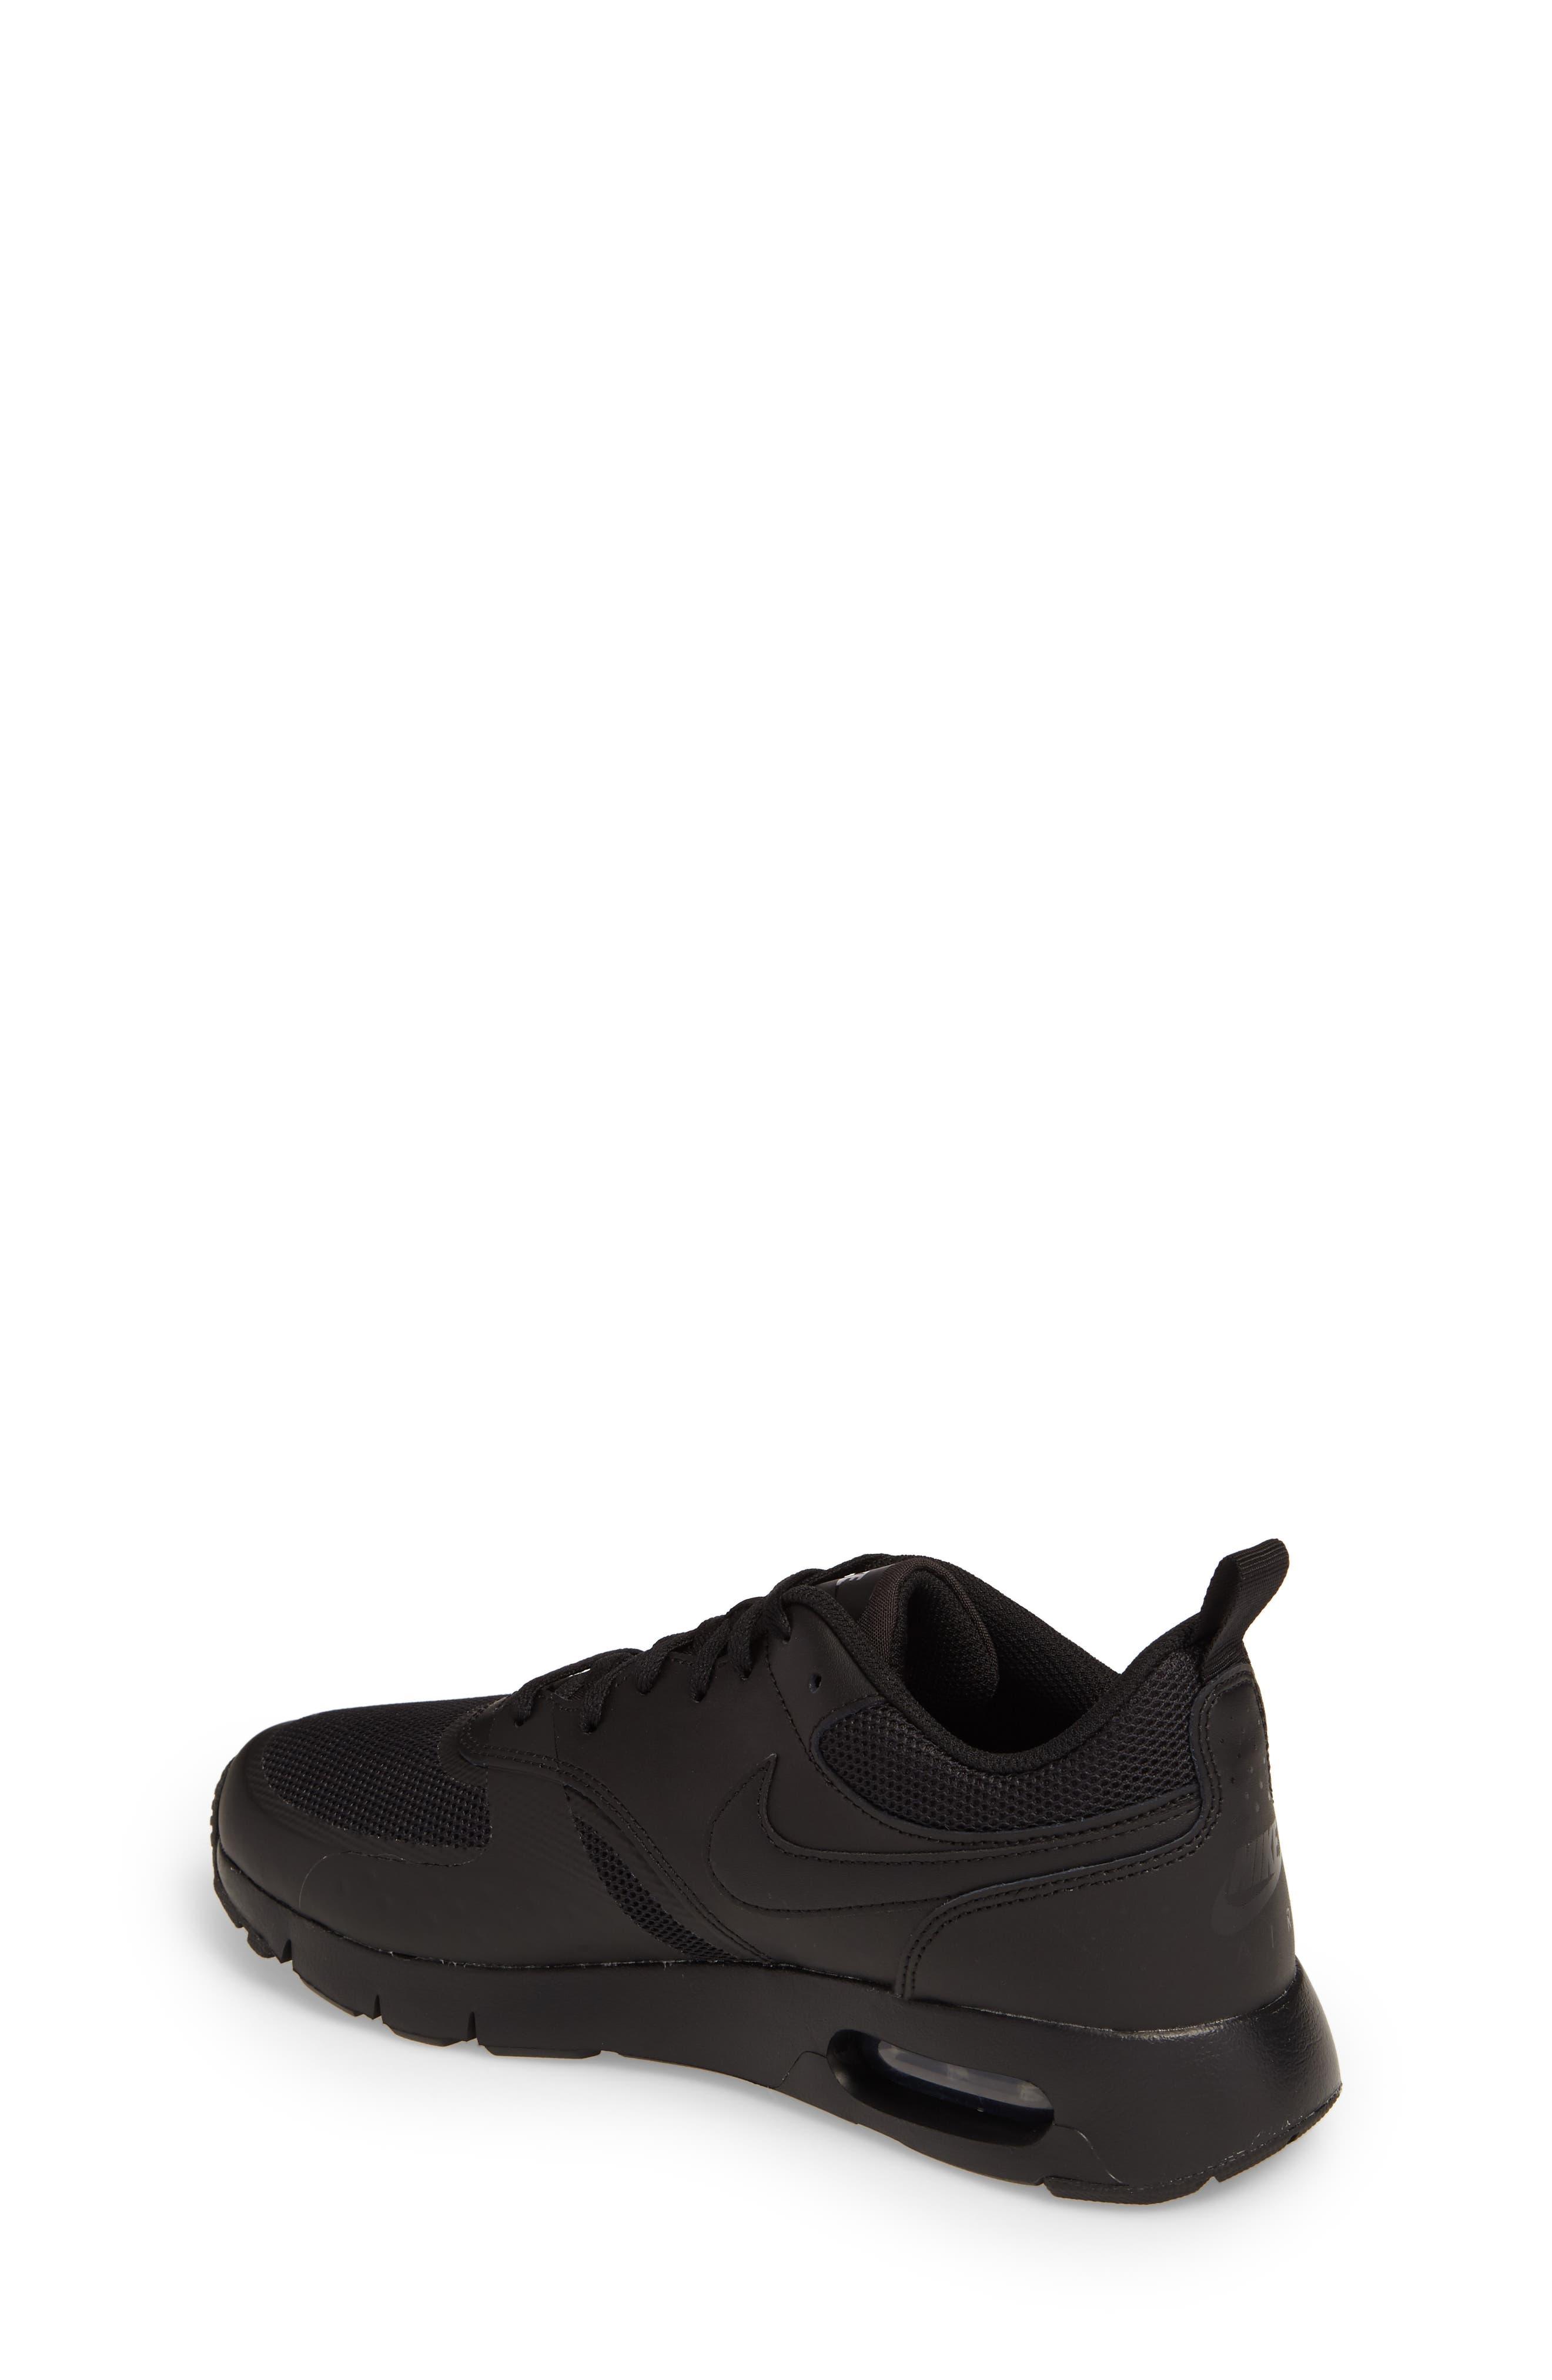 Air Max Vision Sneaker,                             Alternate thumbnail 2, color,                             Black